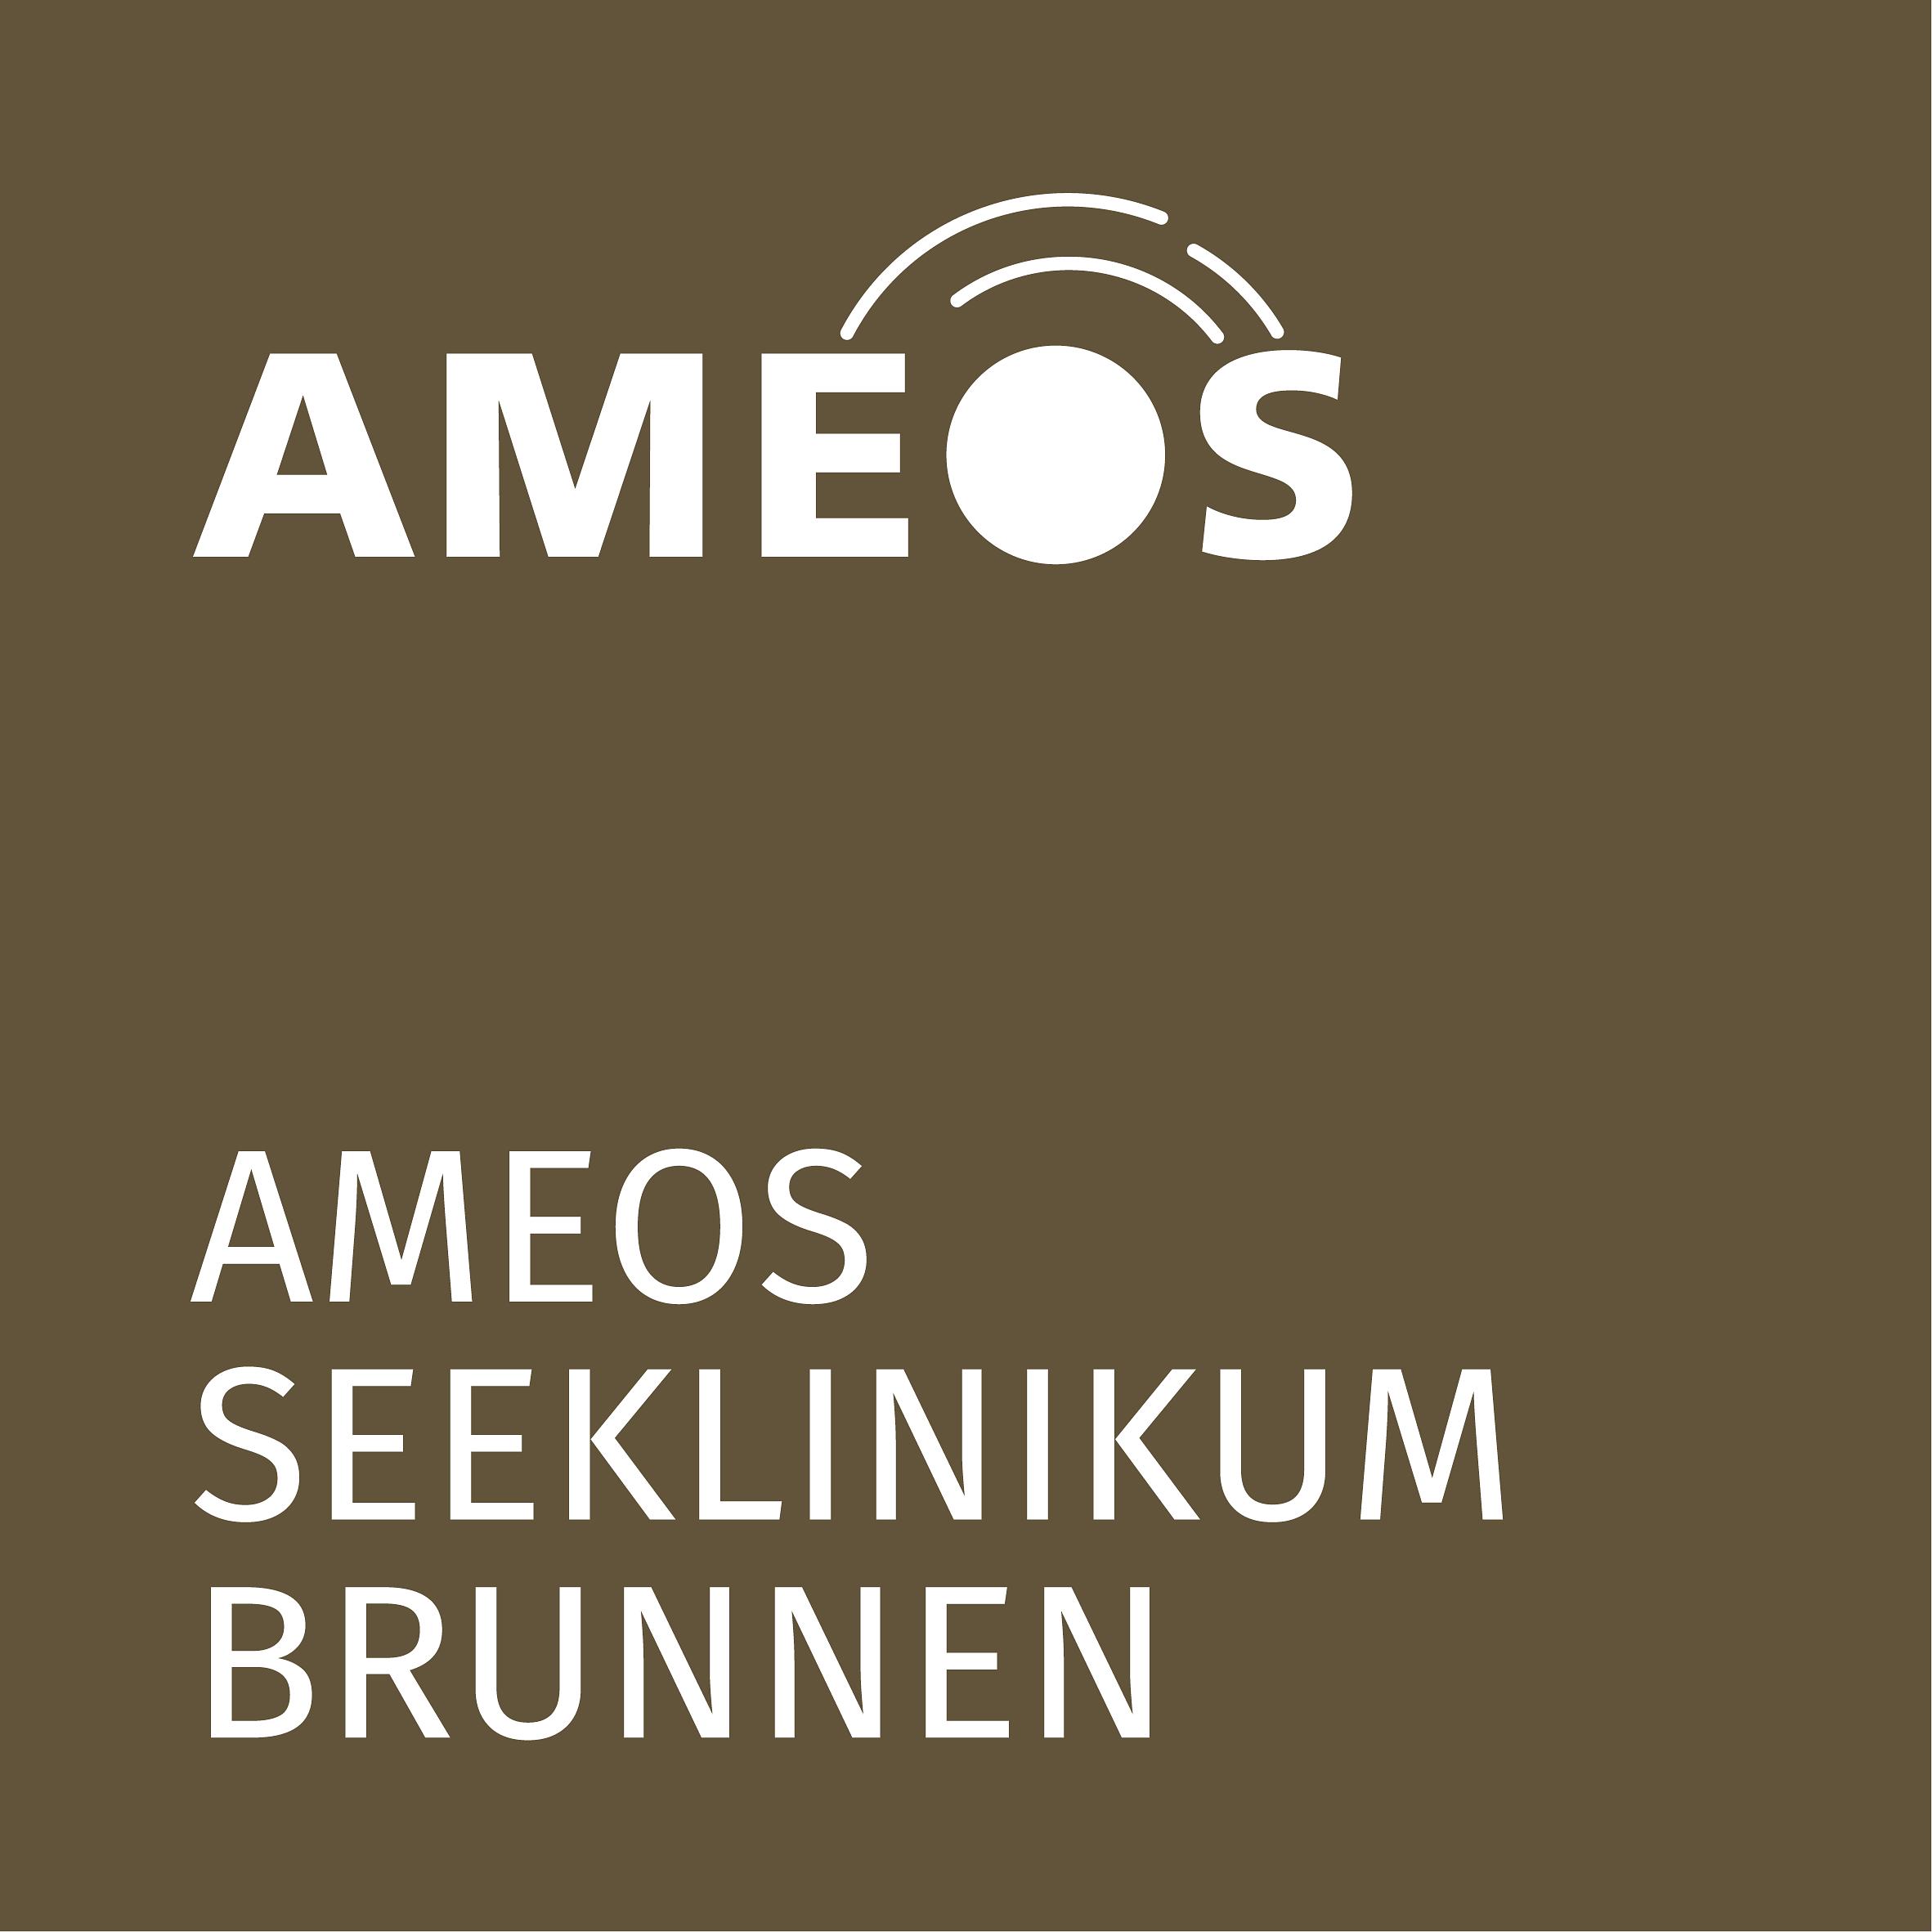 AMEOS Seeklinikum Brunnen